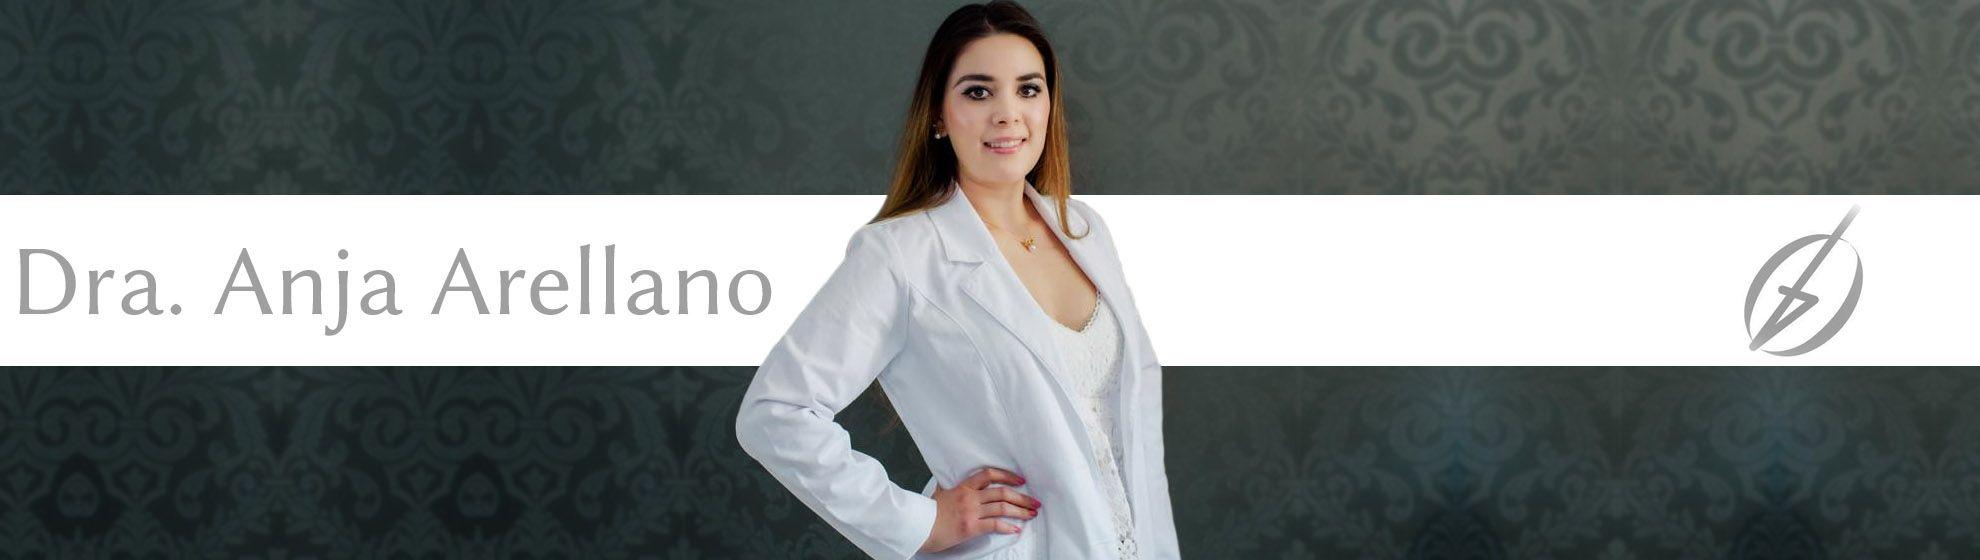 Dra. Anja Arellano